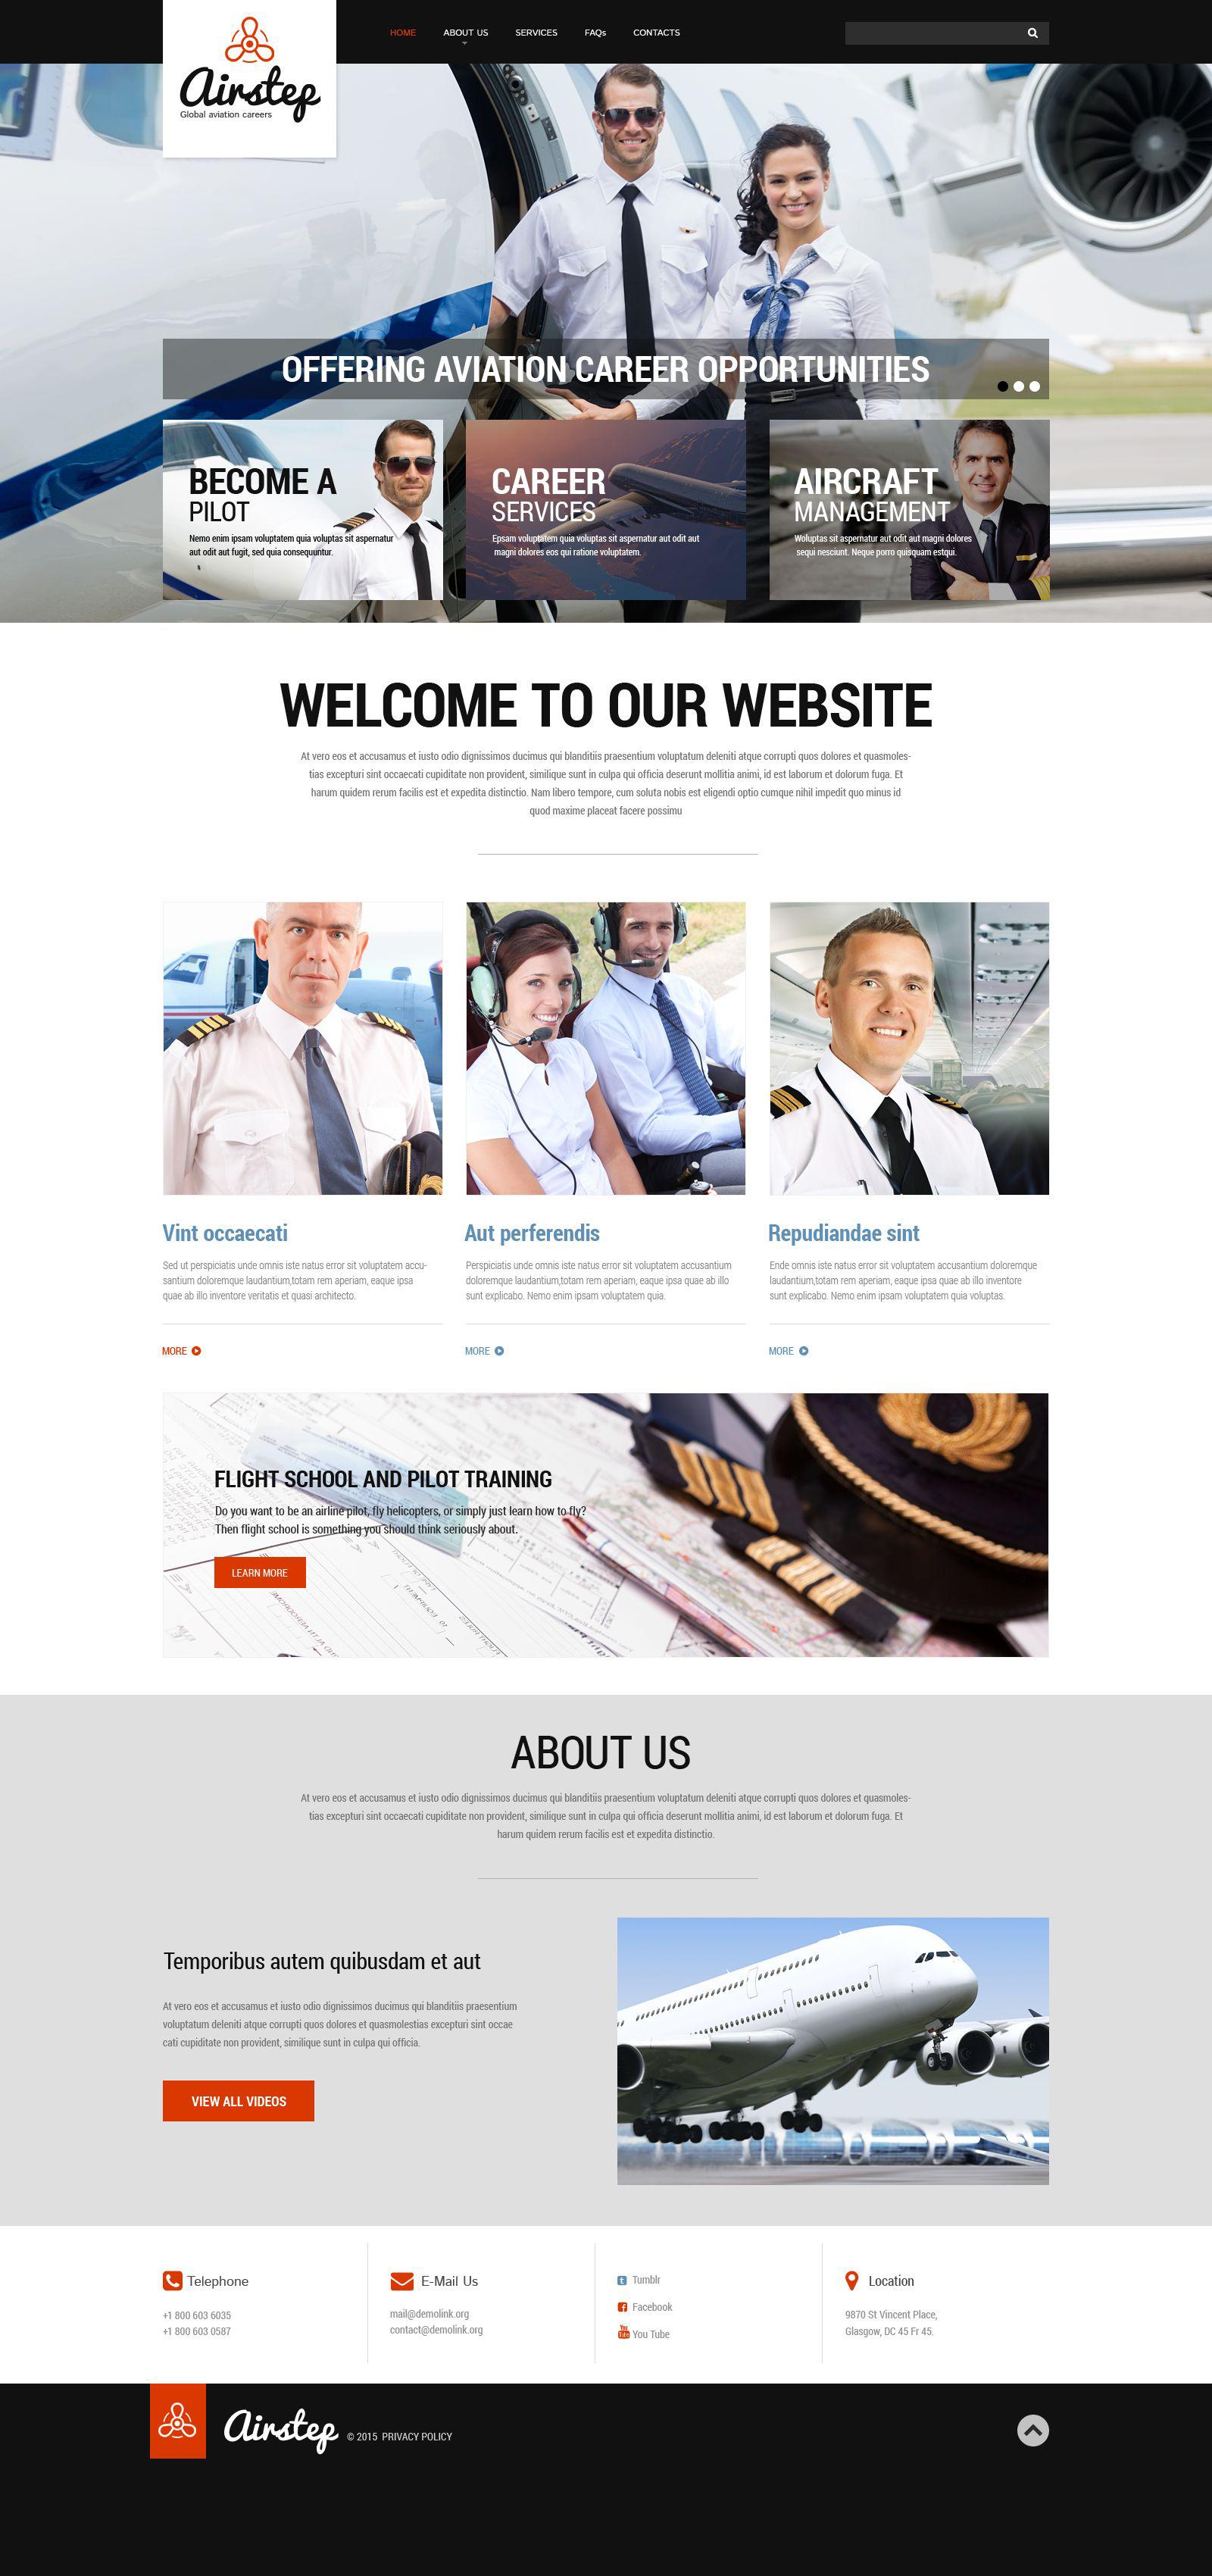 sitio web escoltas privadas vaginal